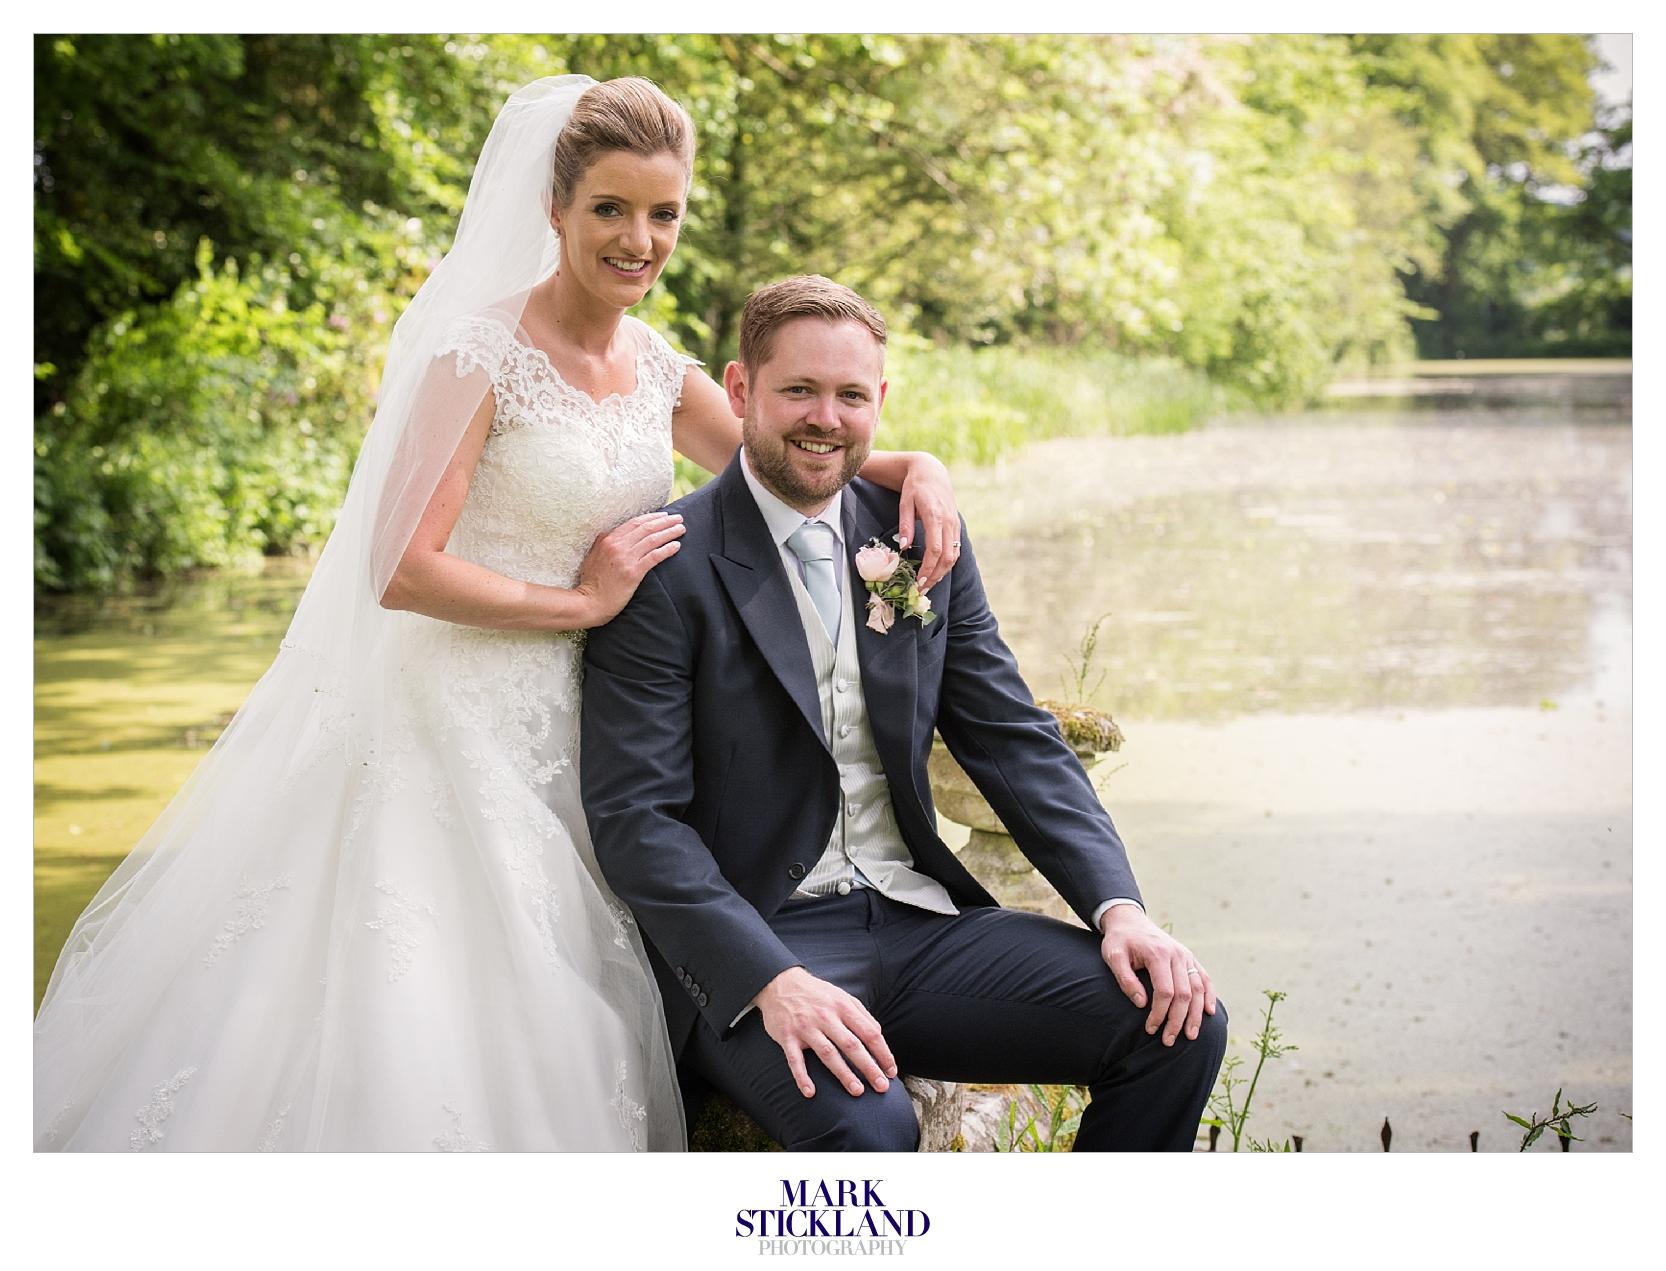 032.deans_court_wedding_wimborne_dorset